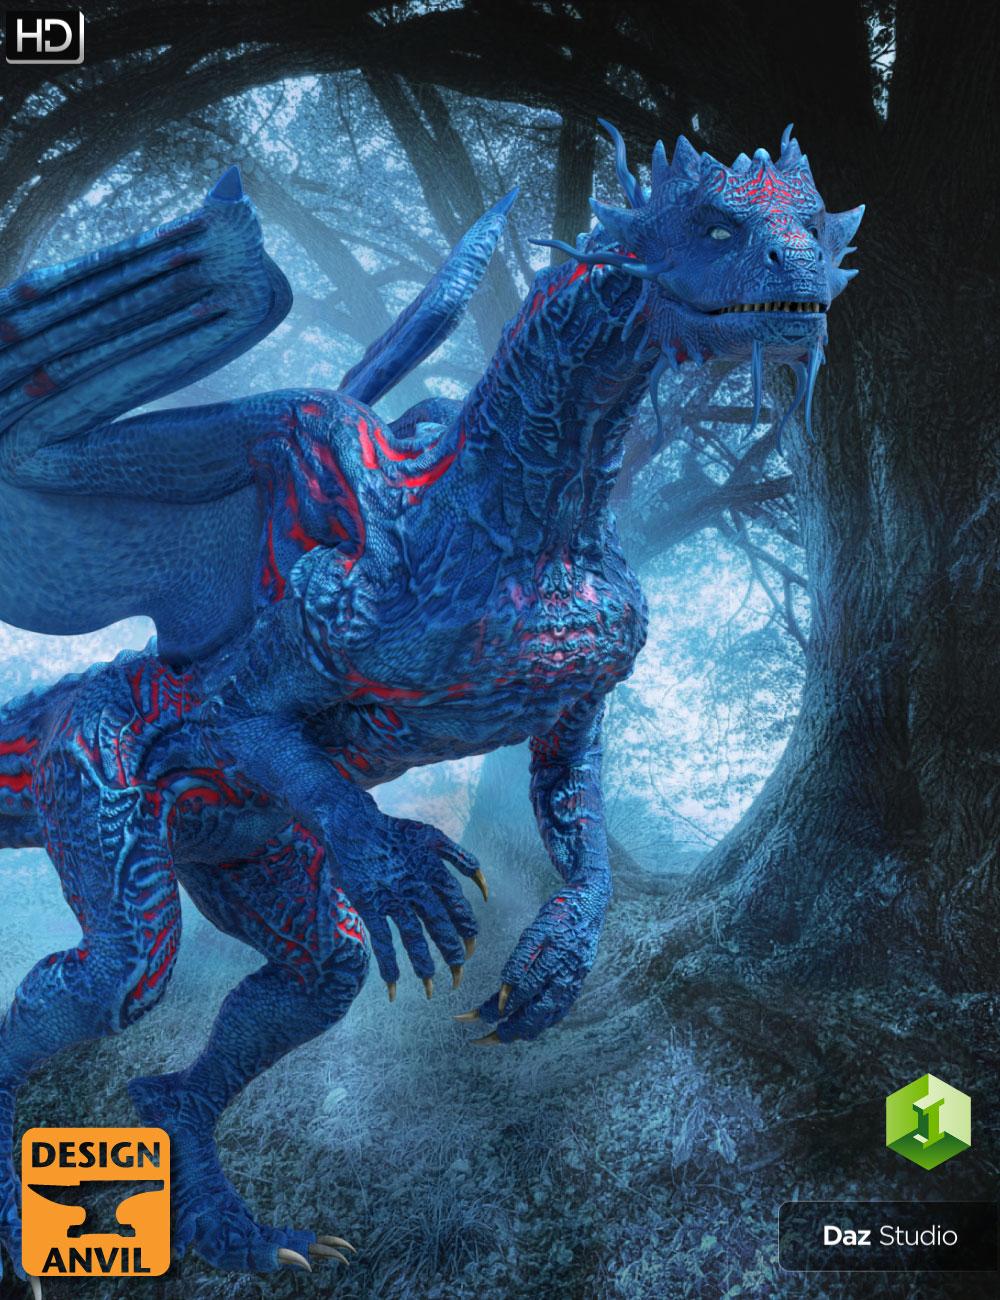 DA Blue Dragon HD for Daz Dragon 3 by: Design Anvil, 3D Models by Daz 3D